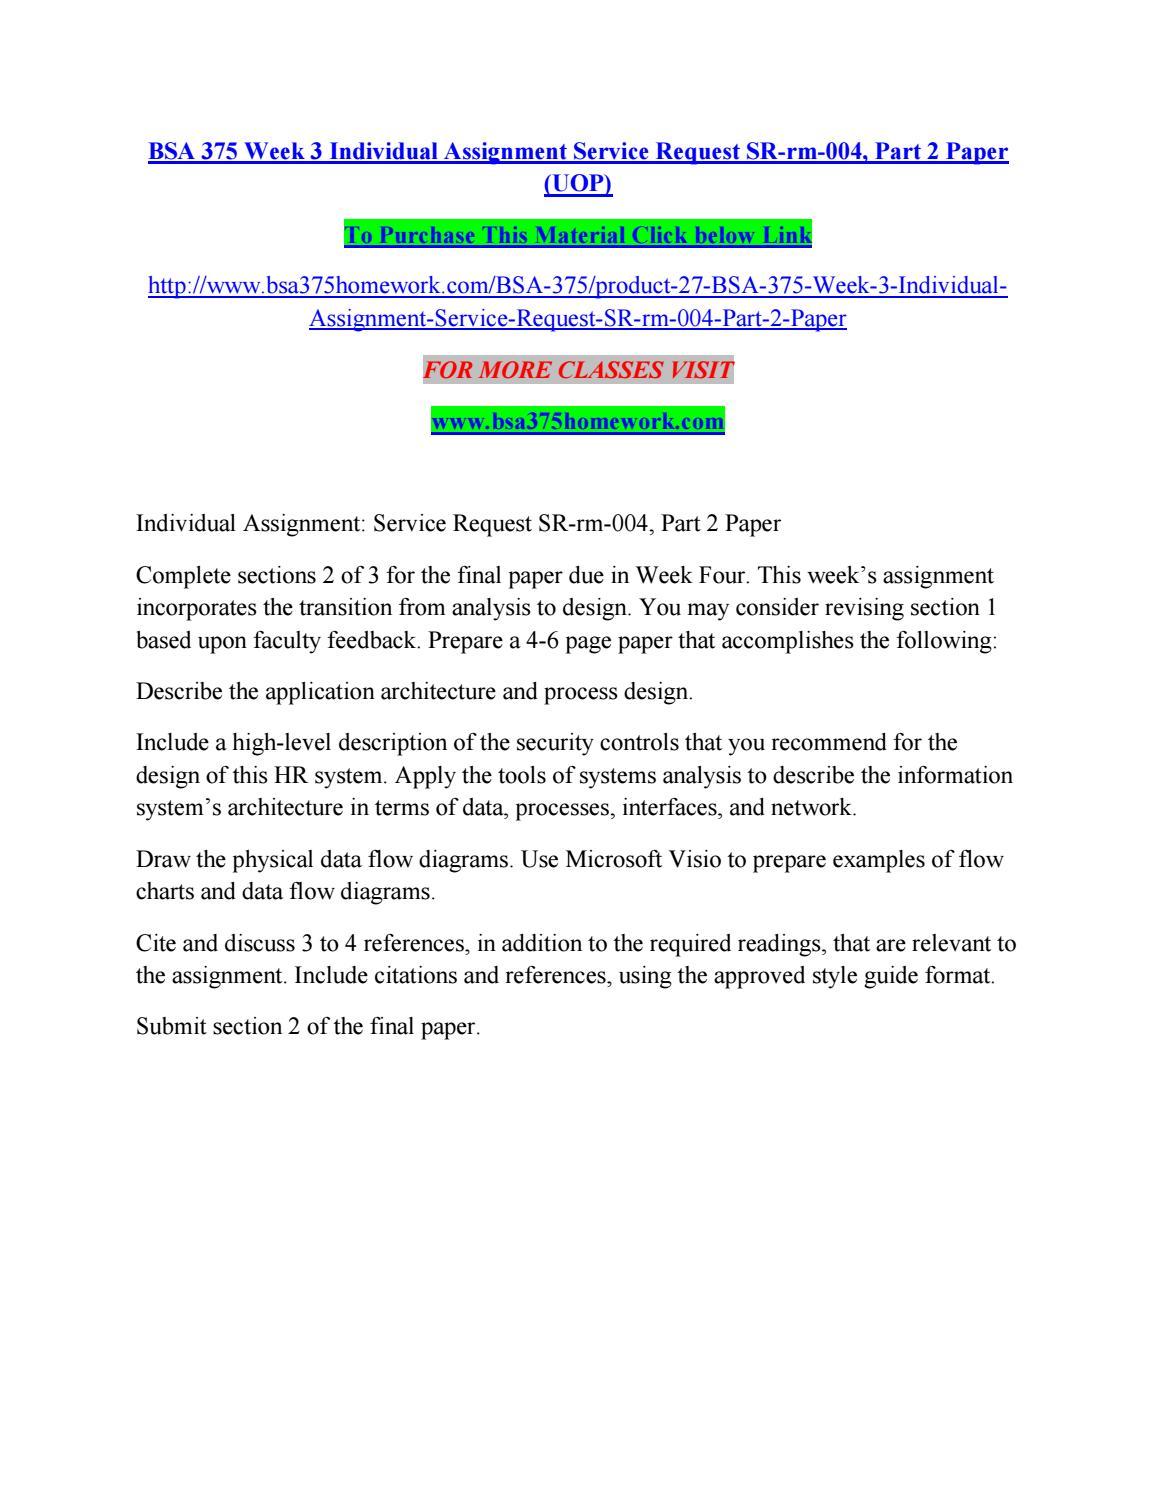 Bsa 375 week 3 individual assignment service request sr rm